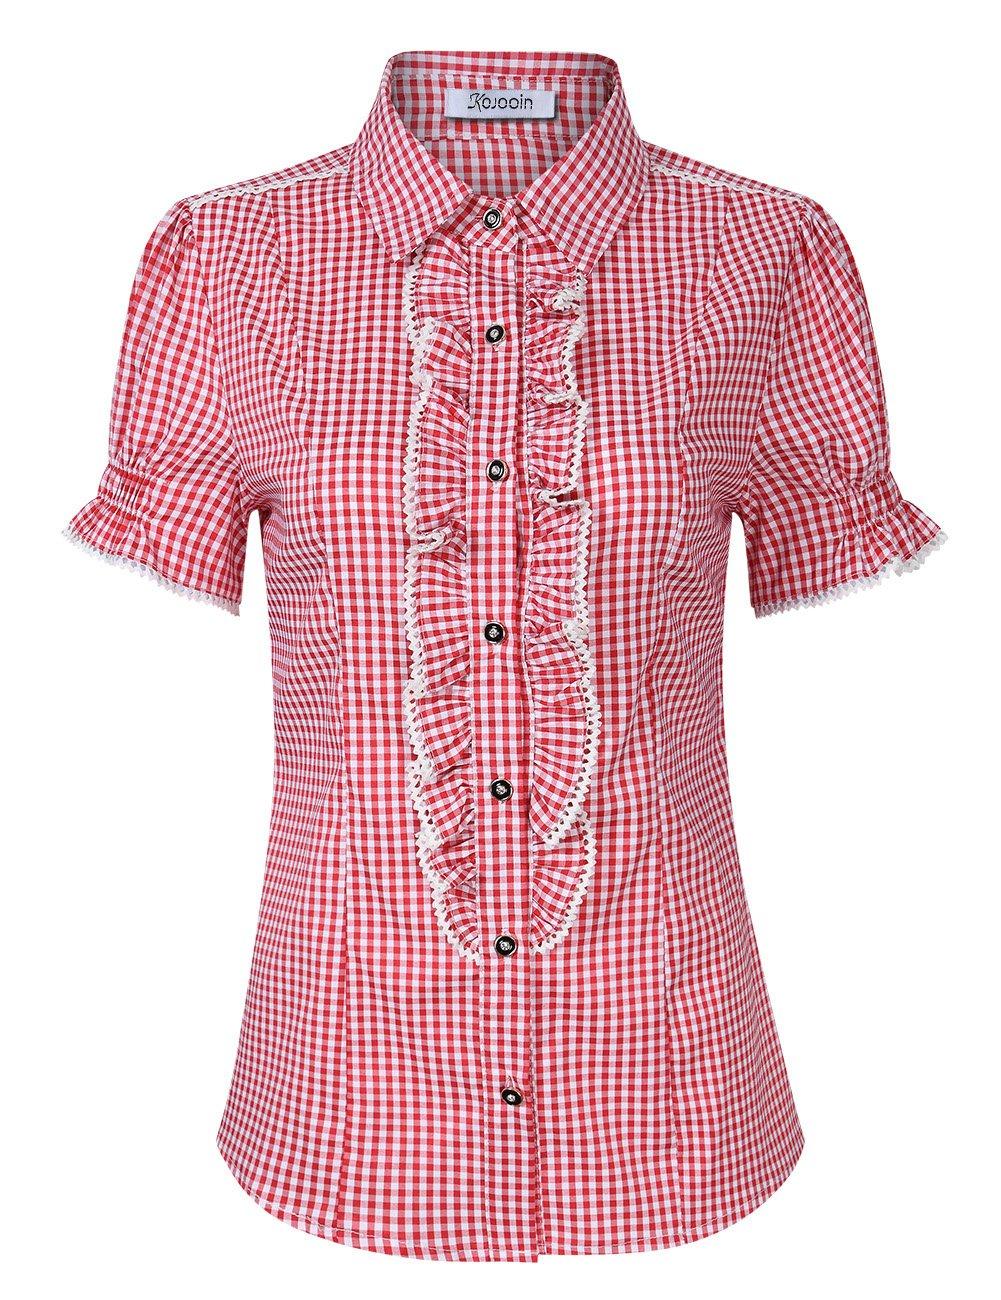 Leoie Women's Beer Festival Plaid Pleated Short Sleeve Casual Shirt for Oktoberfest Red 2XL